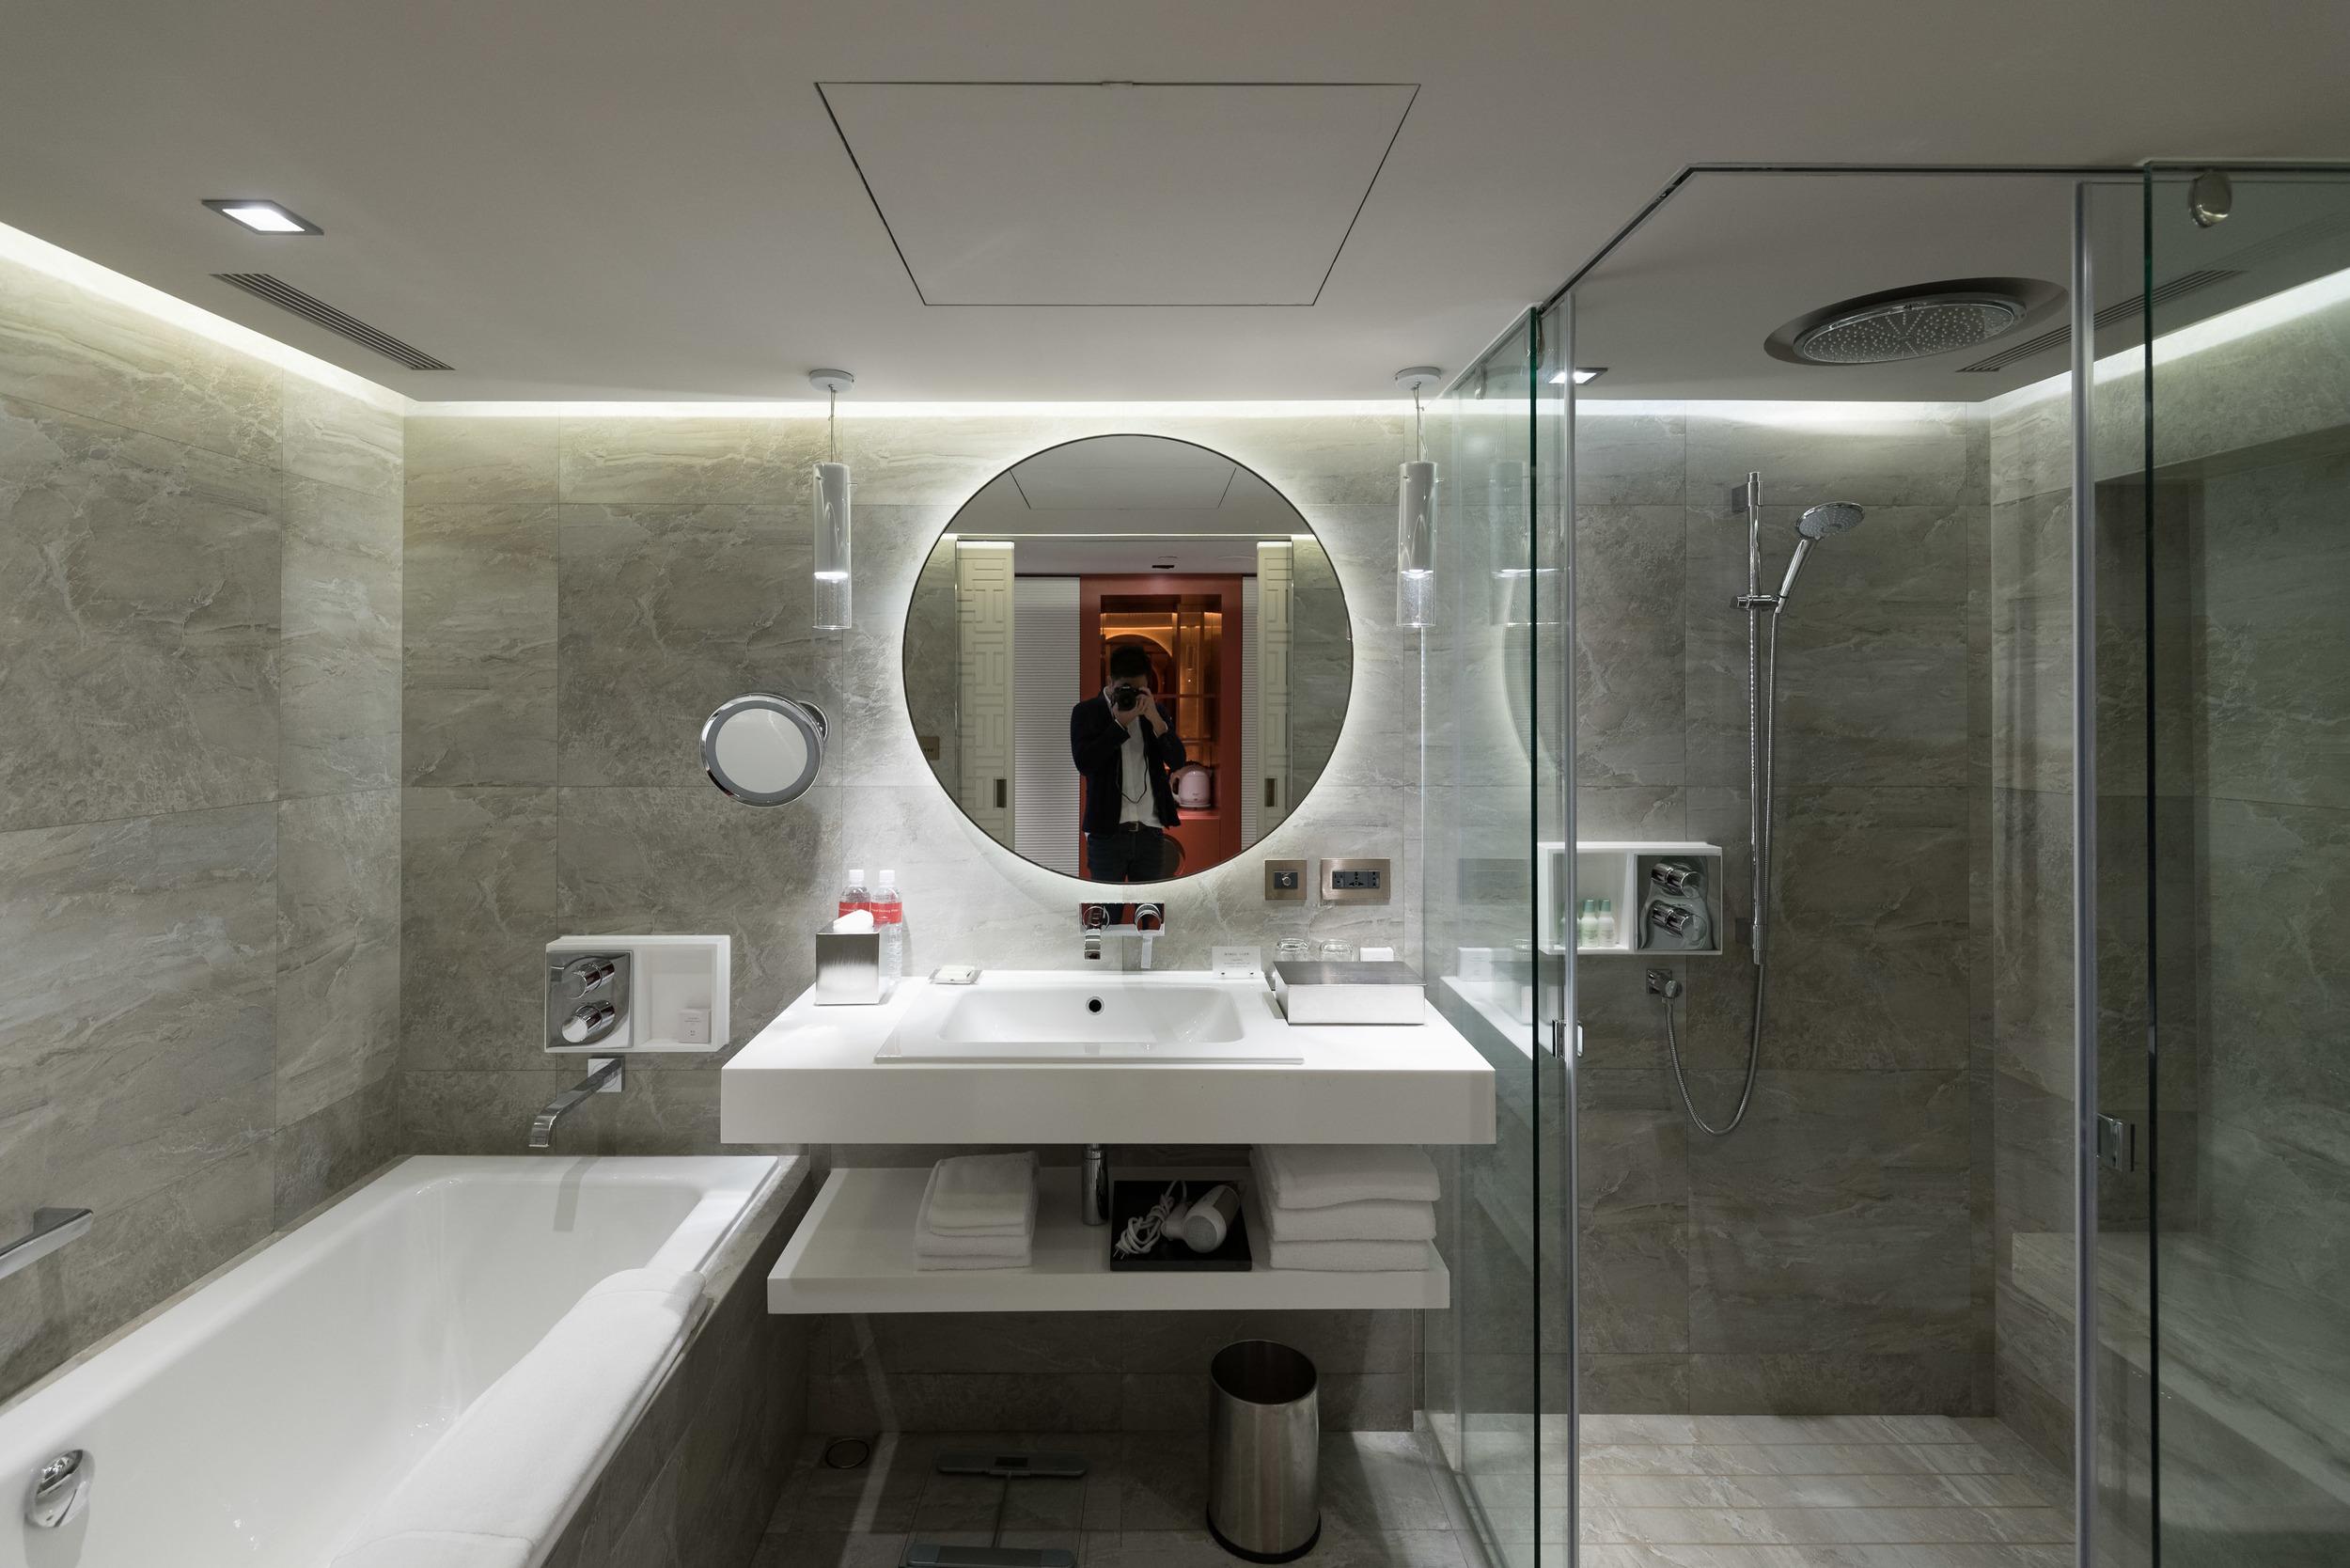 Bathroom of the Grand Deluxe Room - Grand Hyatt Taipei